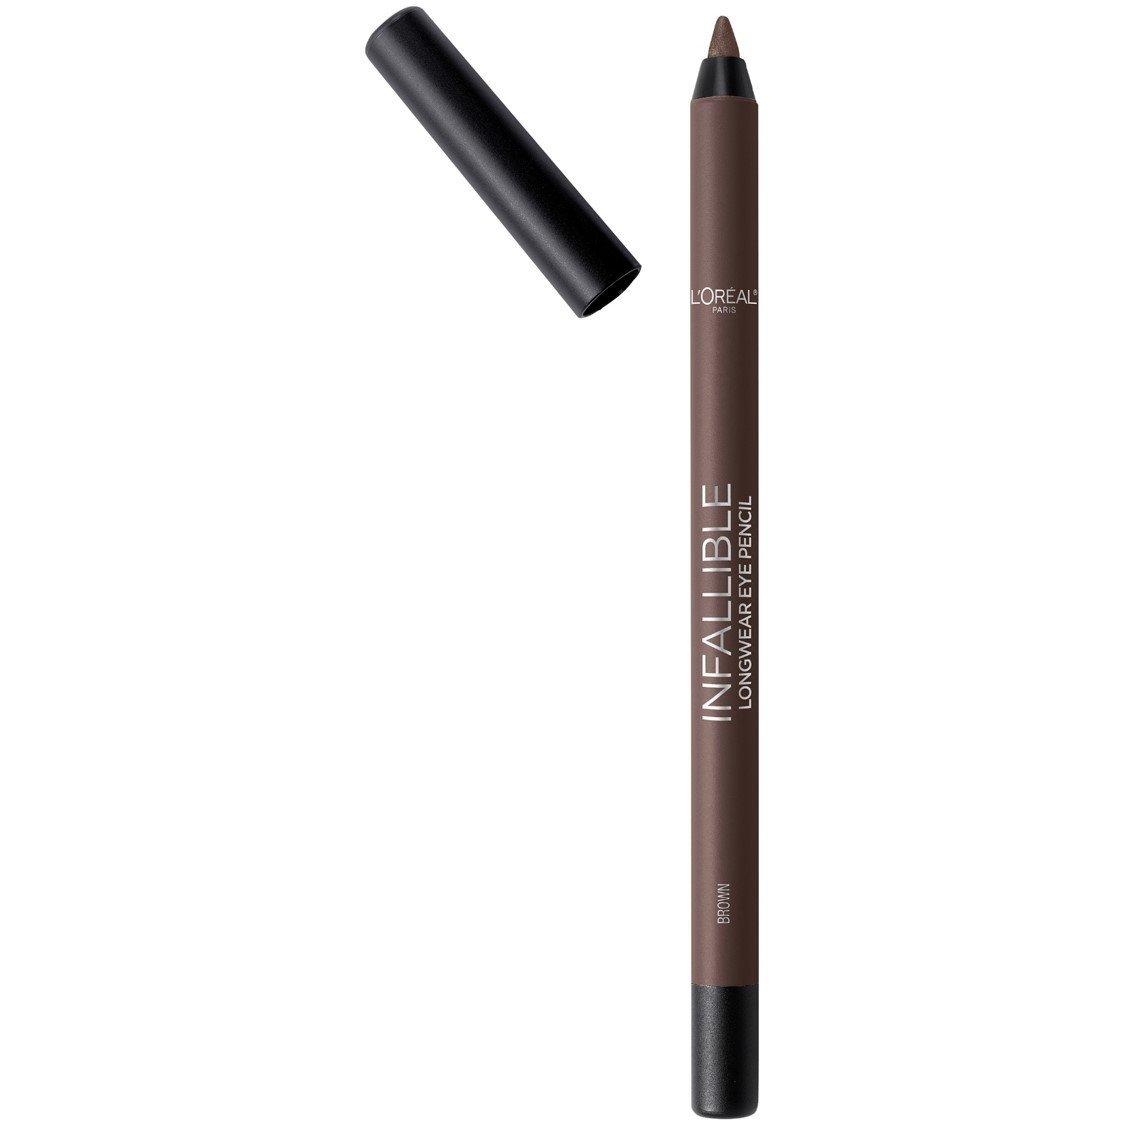 L'Oréal Paris Makeup Infallible Pro-Last Waterproof Pencil Eyeliner, Brown, 0.042 oz.